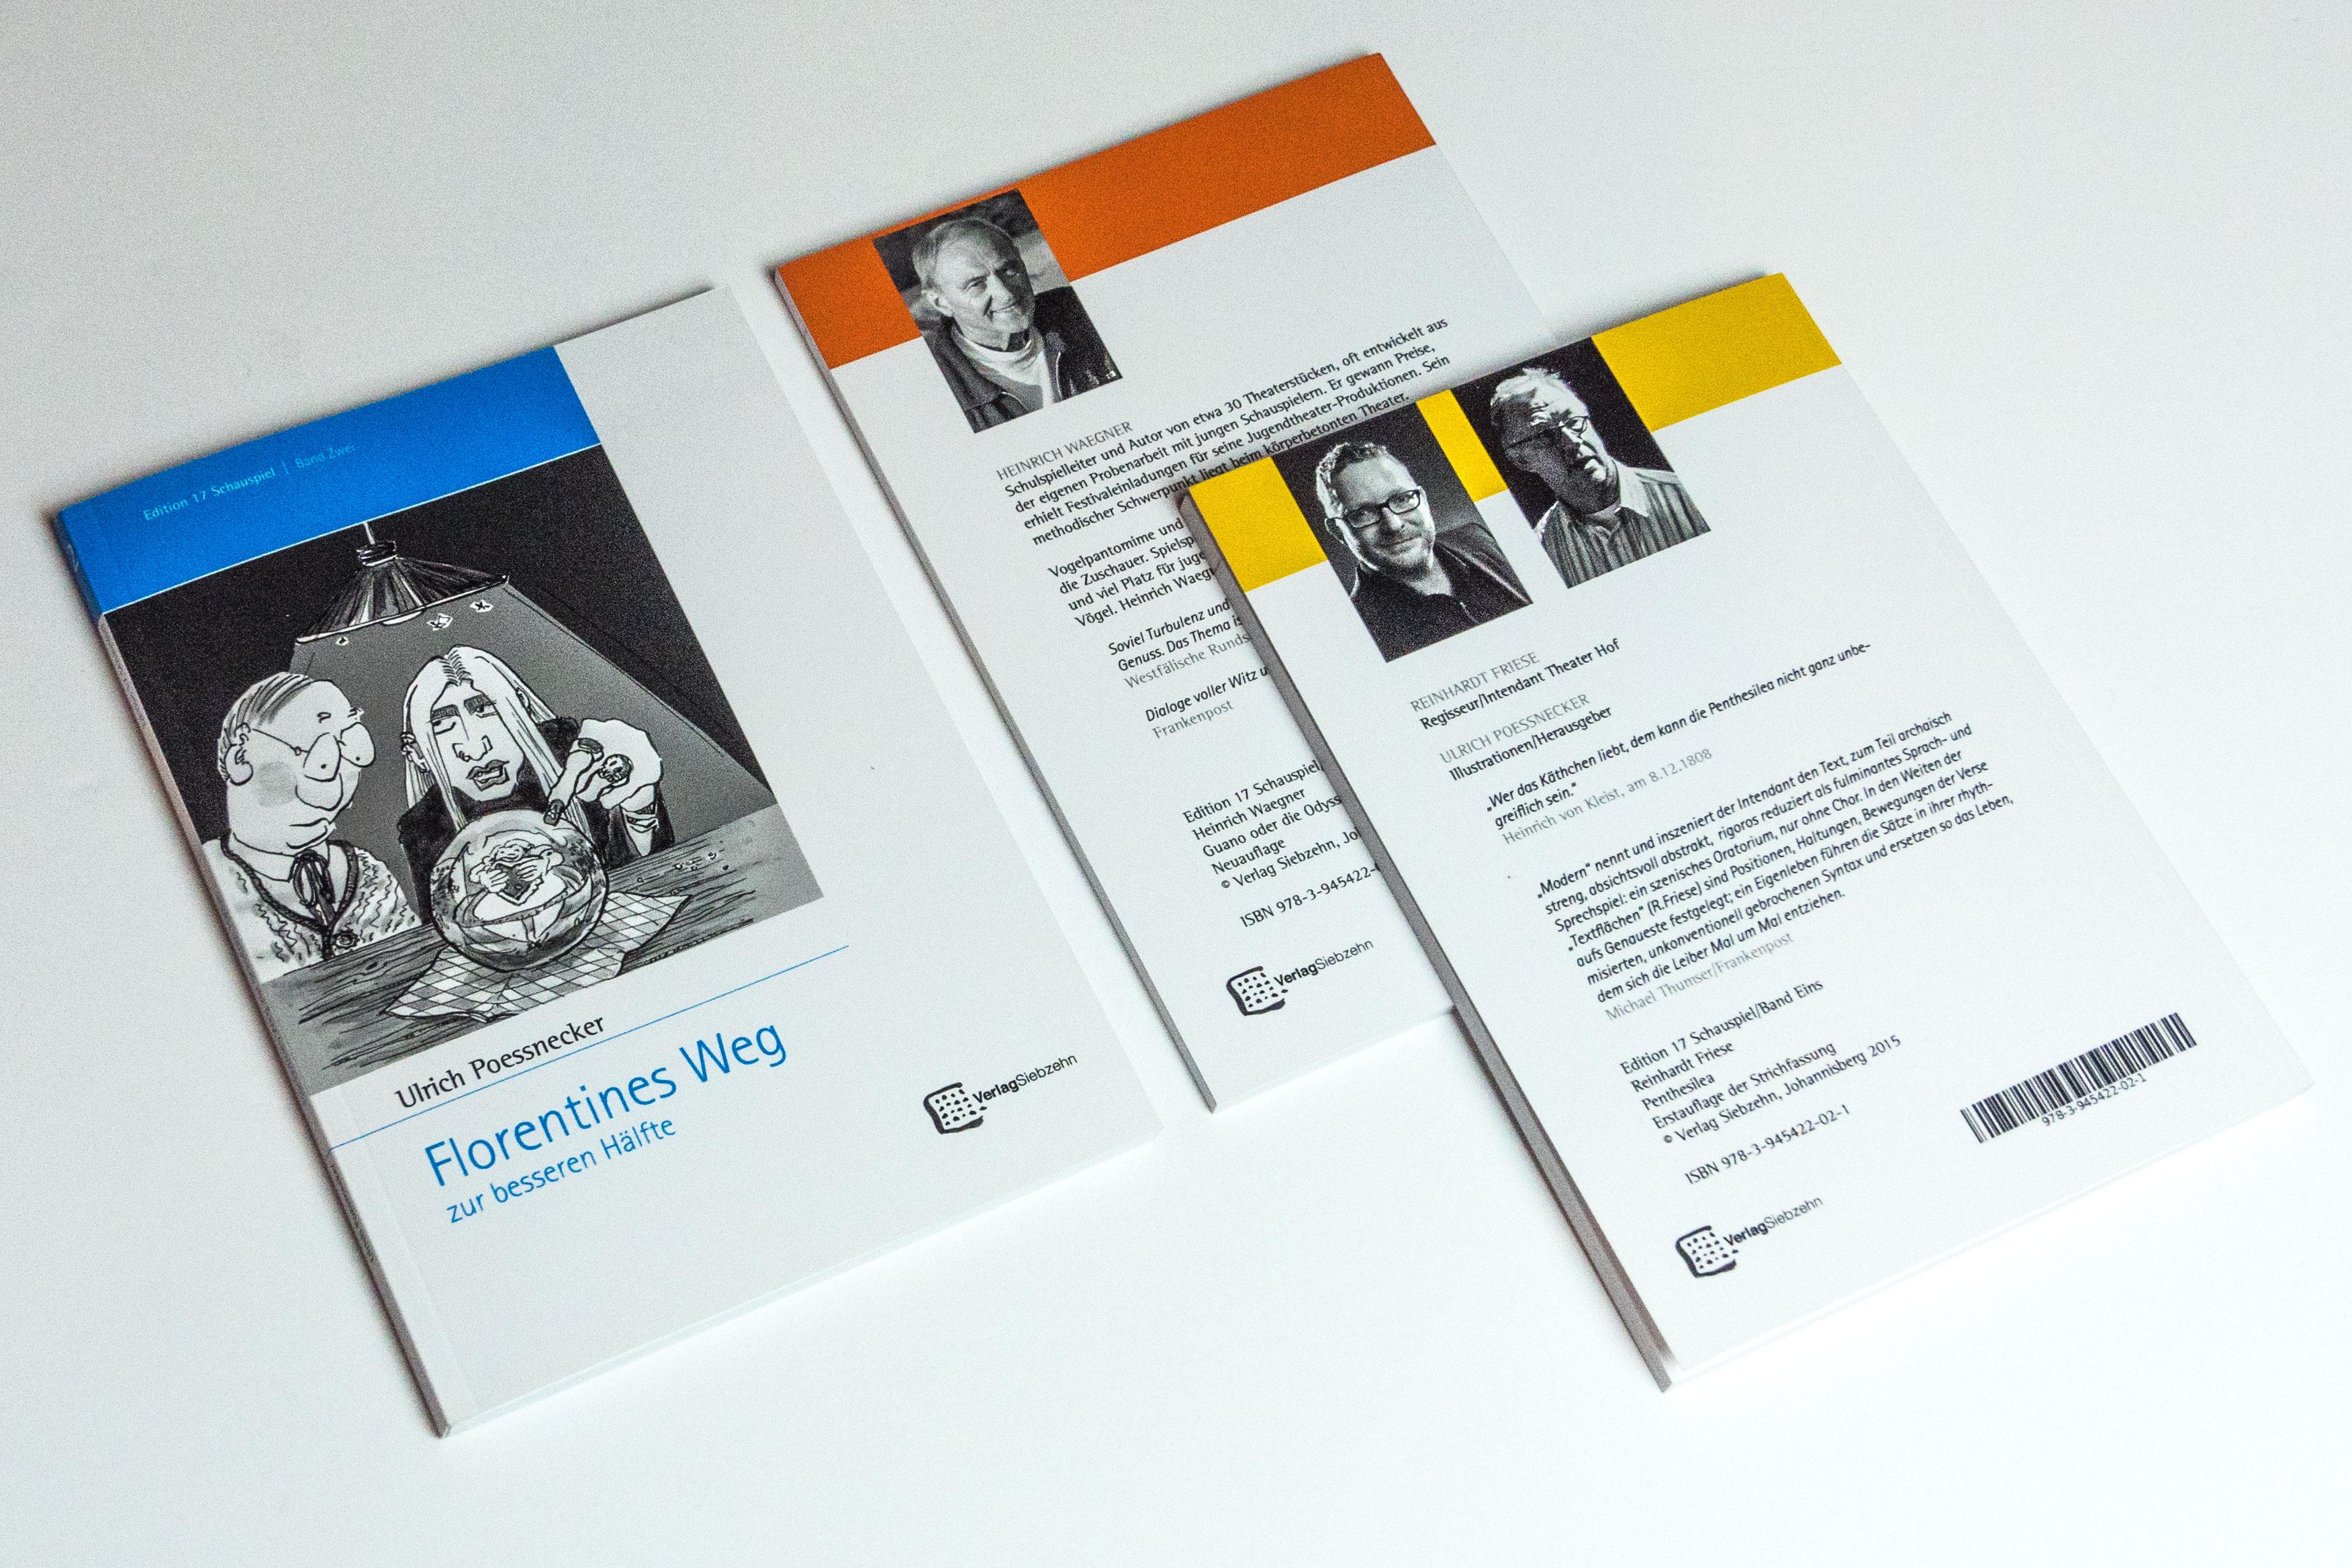 Verlag Siebzehn, Johannisberg